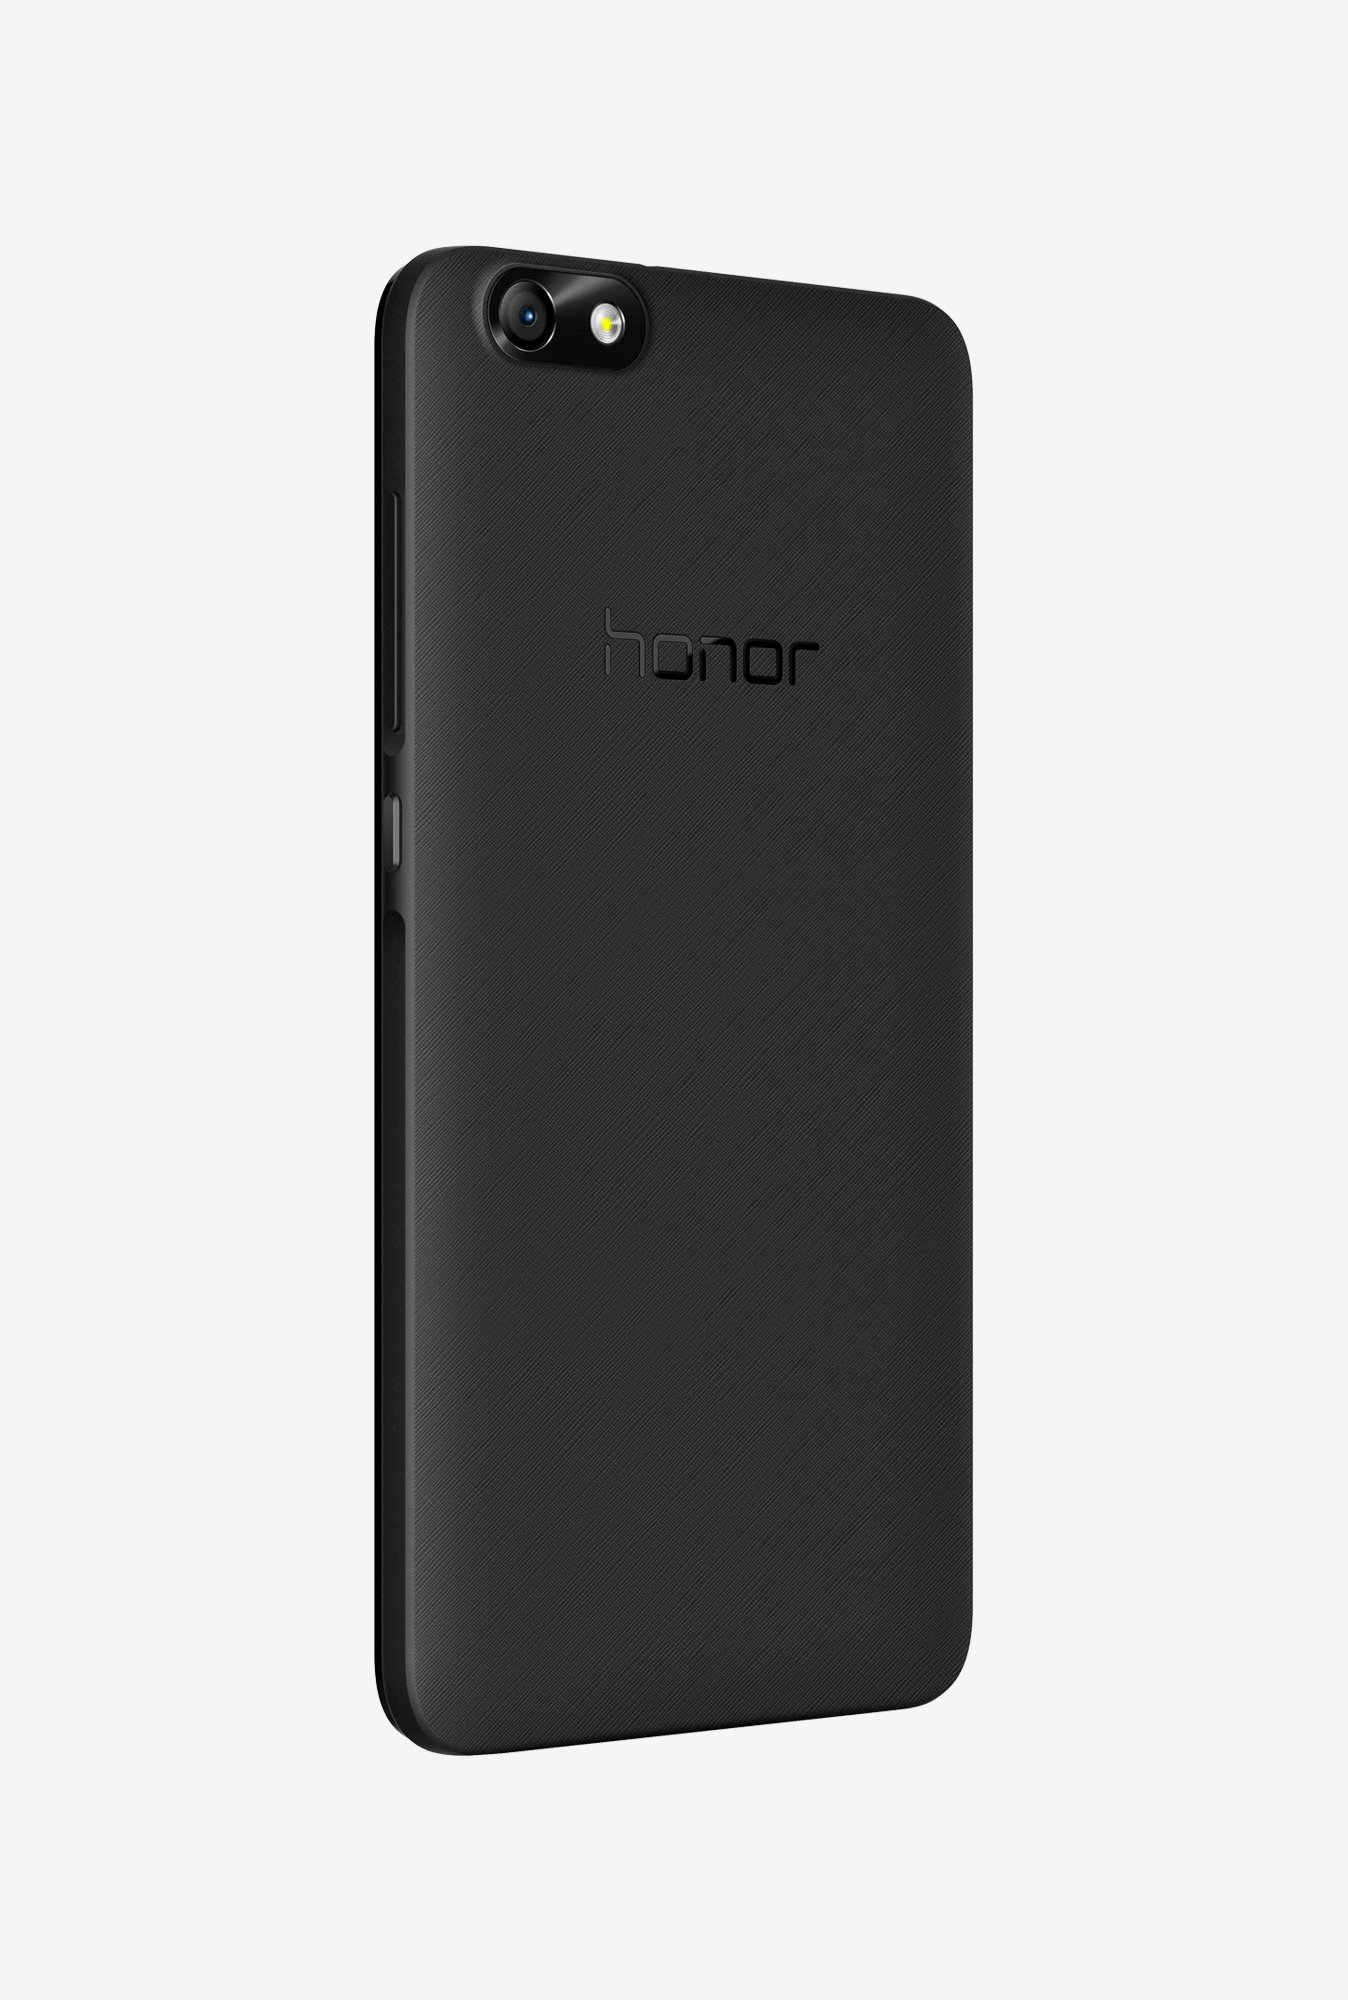 Honor 4X (Huawei che1-L04) 8GB Black Mobile